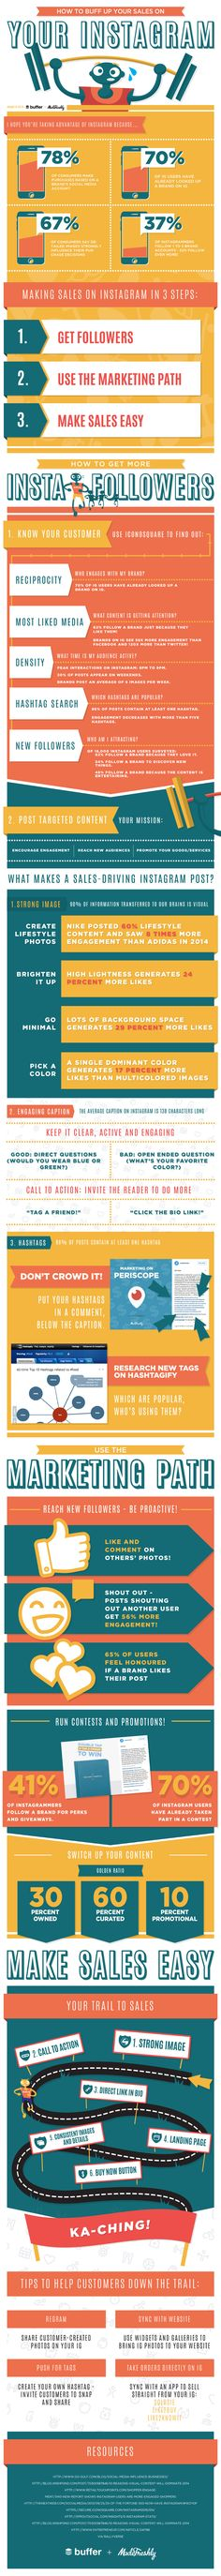 17 Ways to Increase Instagram Engagement